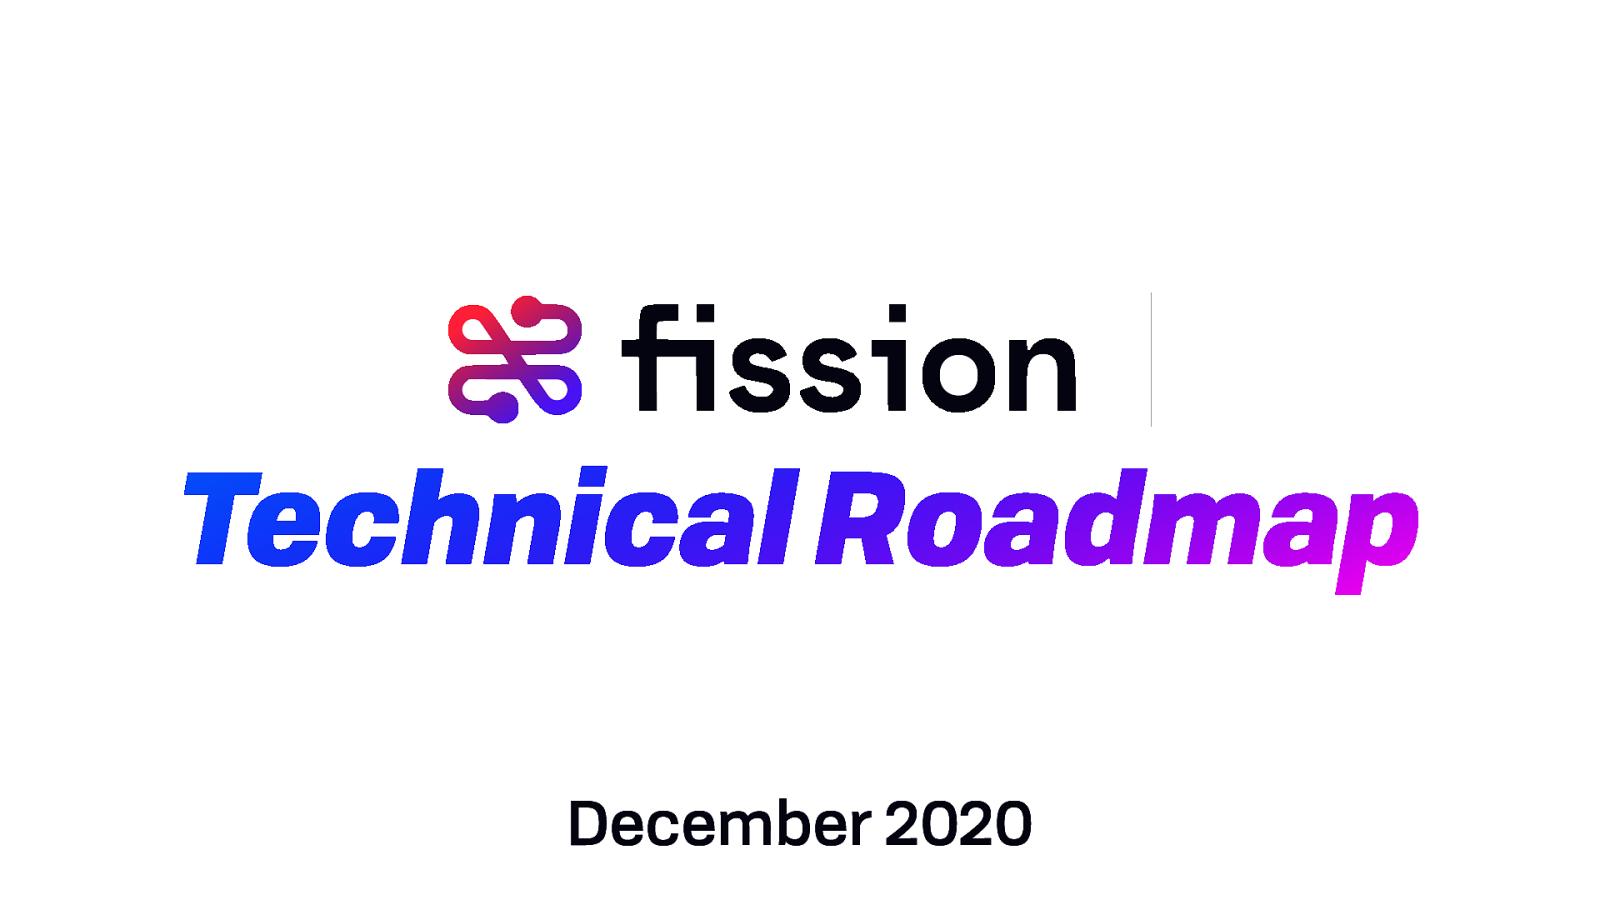 Fission Technical Roadmap —Dec 2020